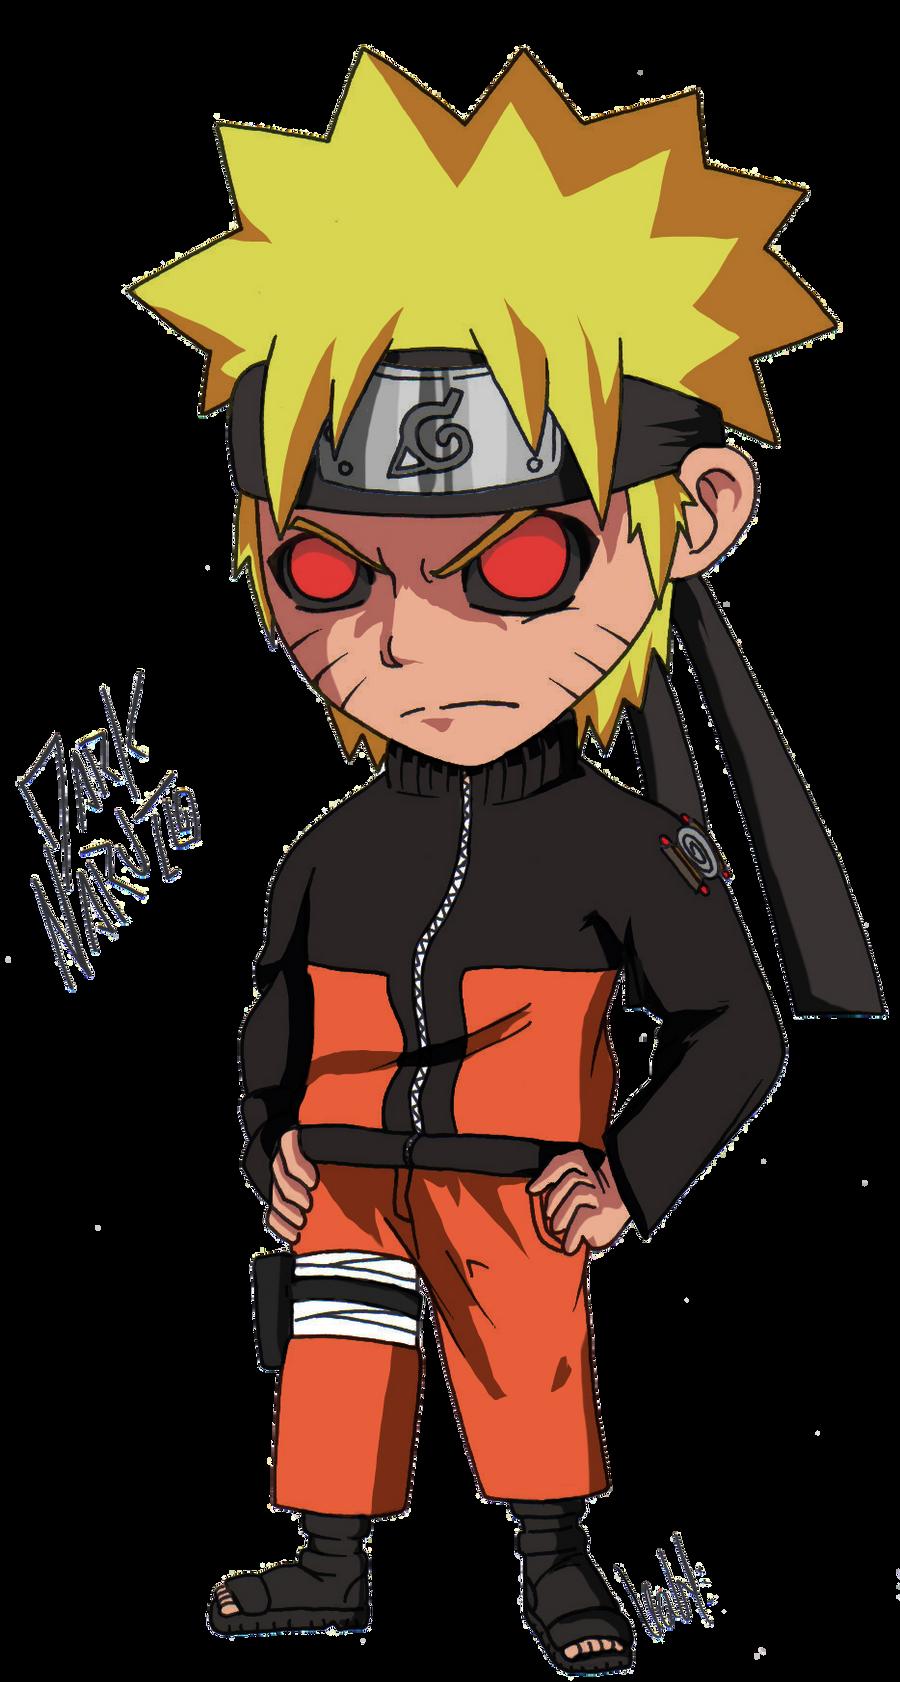 Dark naruto chibi by narutoxsakuralove on deviantart - Naruto chibi images ...